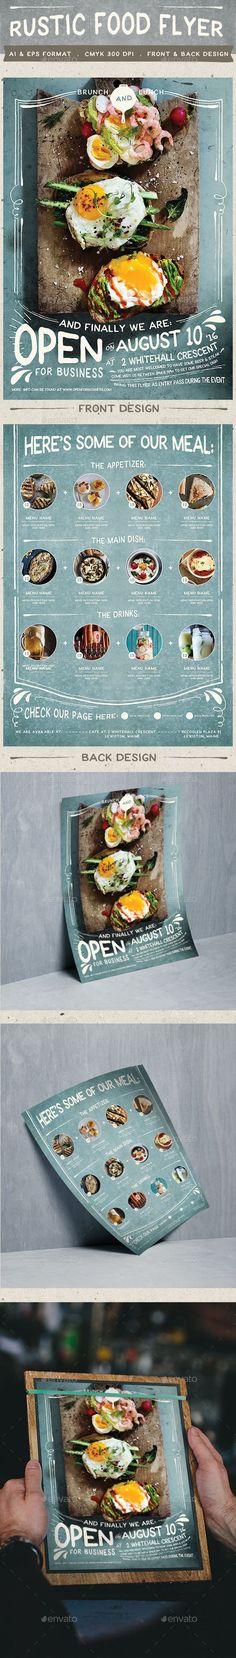 Rustic Food Promo Flyer